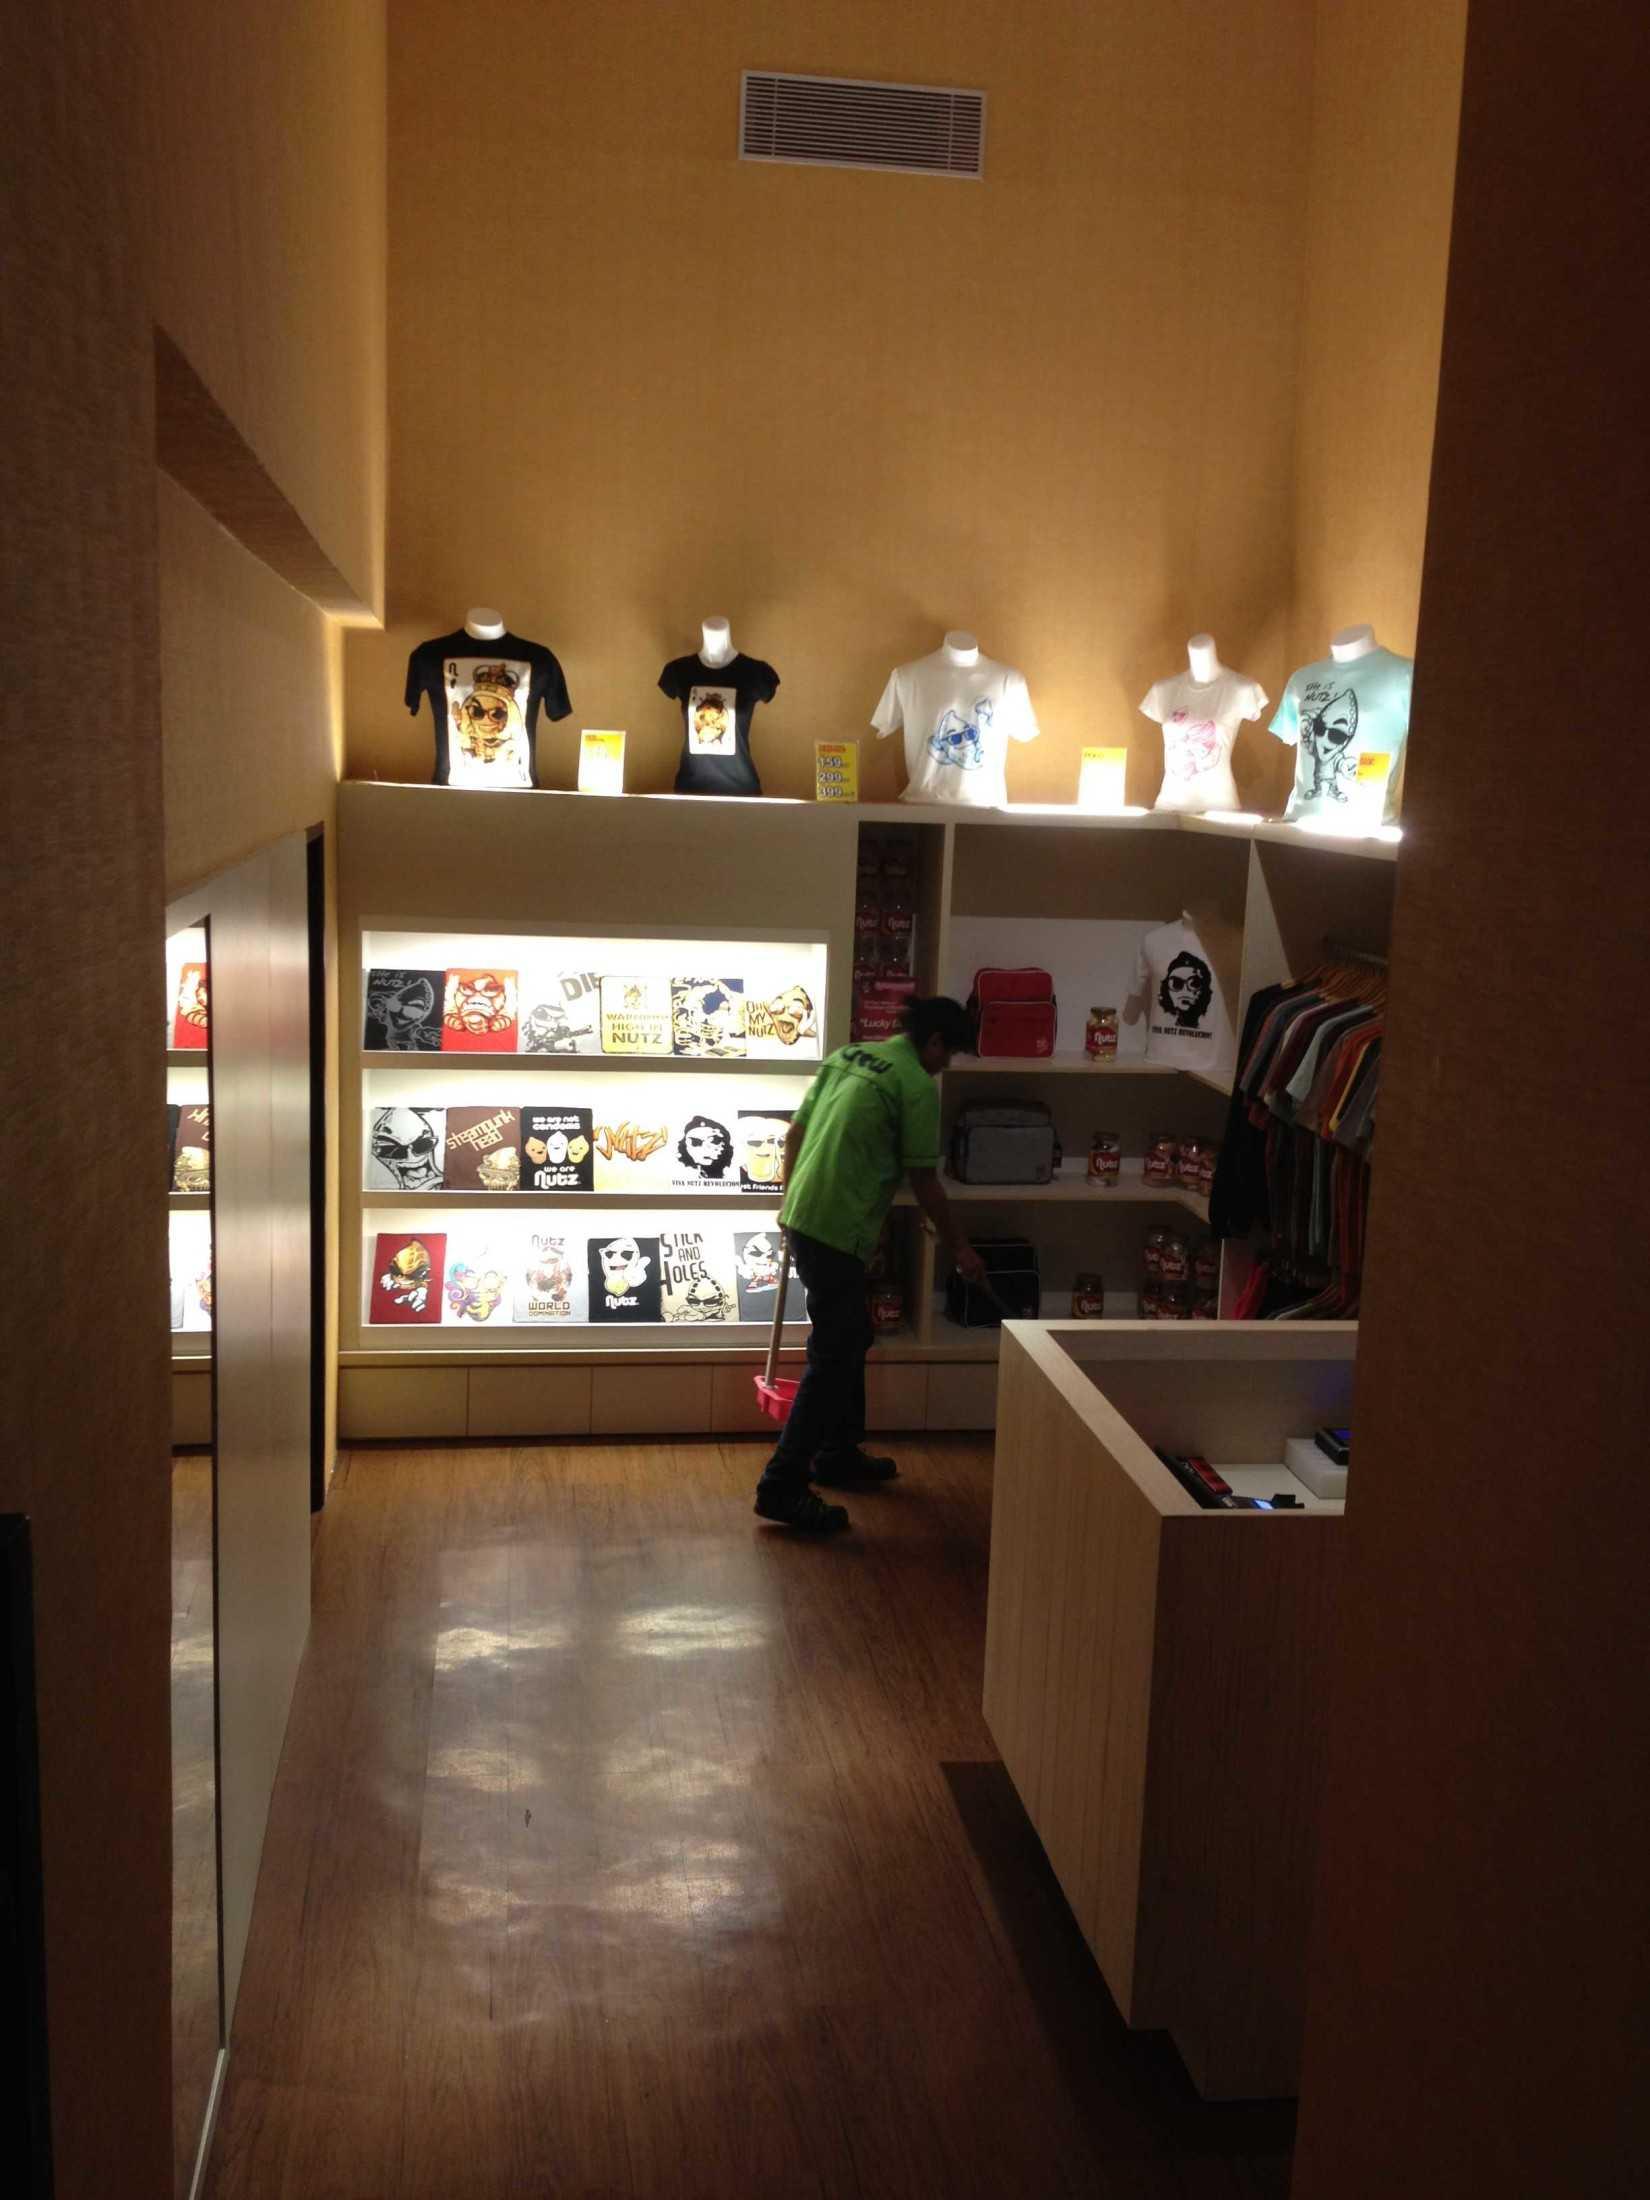 Astana Interior Blackberry Store Mkg Jakarta, Daerah Khusus Ibukota Jakarta, Indonesia Jakarta, Daerah Khusus Ibukota Jakarta, Indonesia Astana-Interior-Blackberry-Store-Mkg  58058